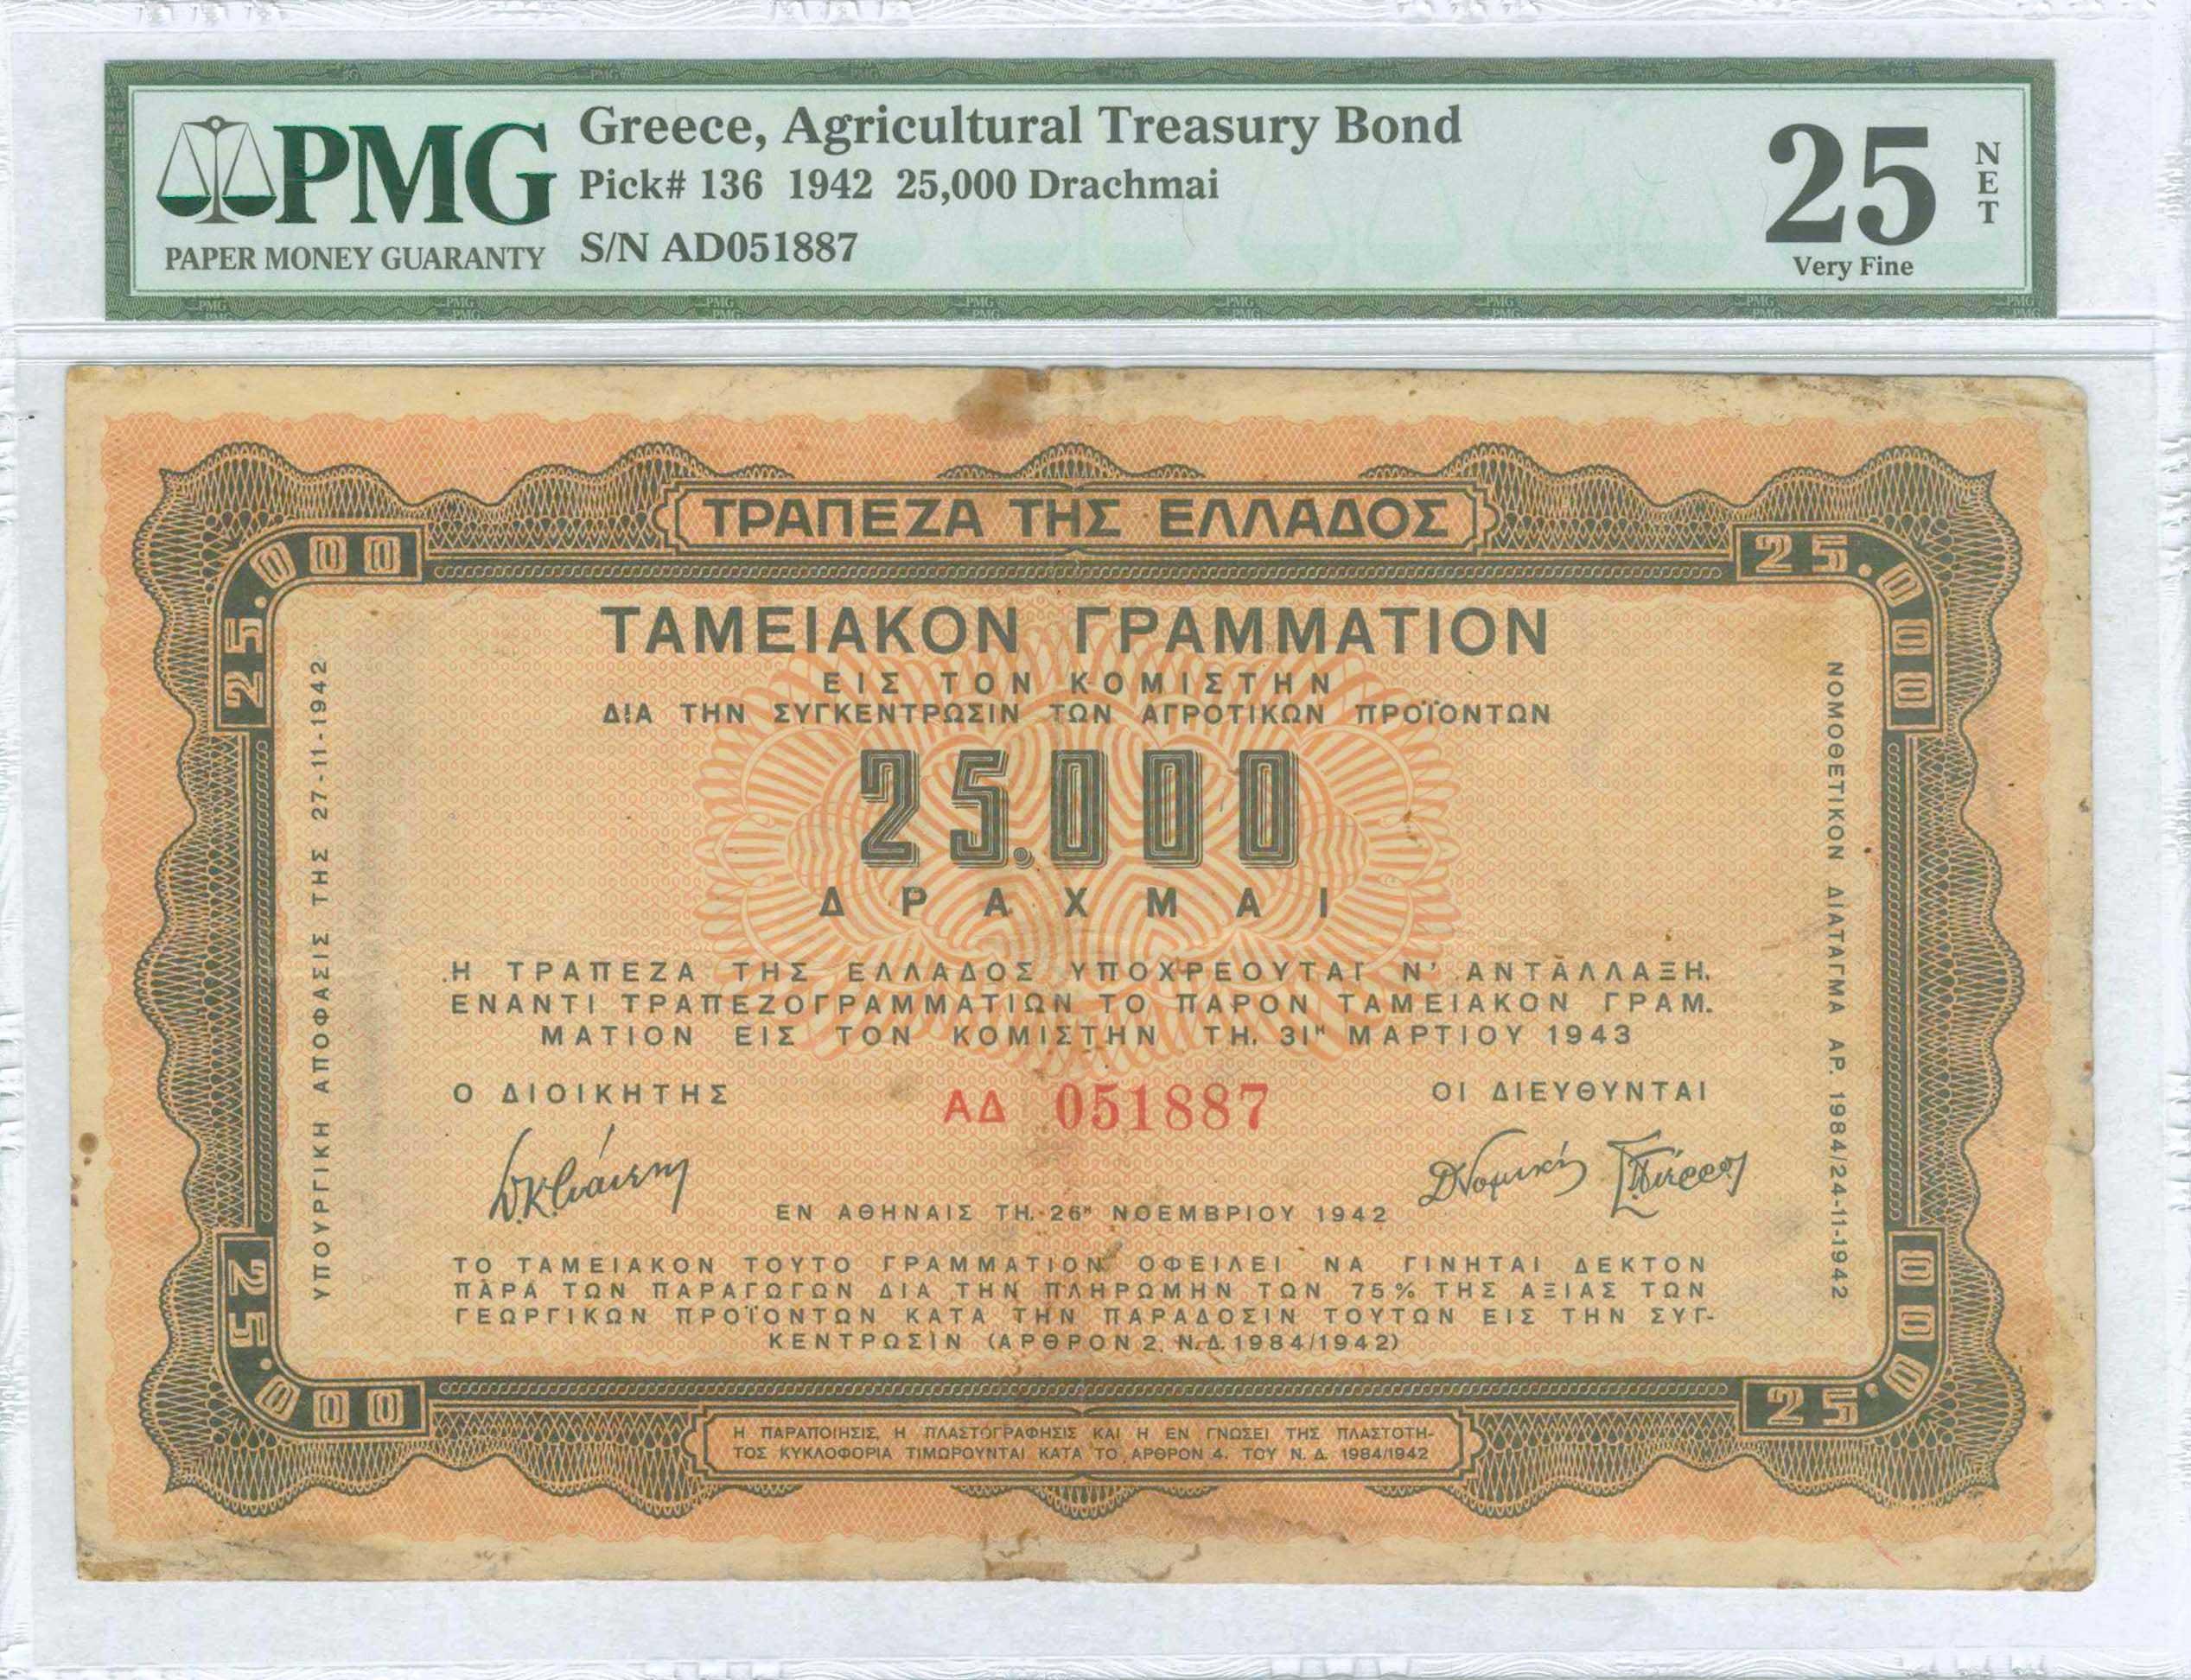 Lot 9382 - GREECE-  PAPER MONEY - BANKNOTES TREASURY BONDS & FISCAL NOTES -  A. Karamitsos Public & LIVE Bid Auction 610 Coins, Medals & Banknotes